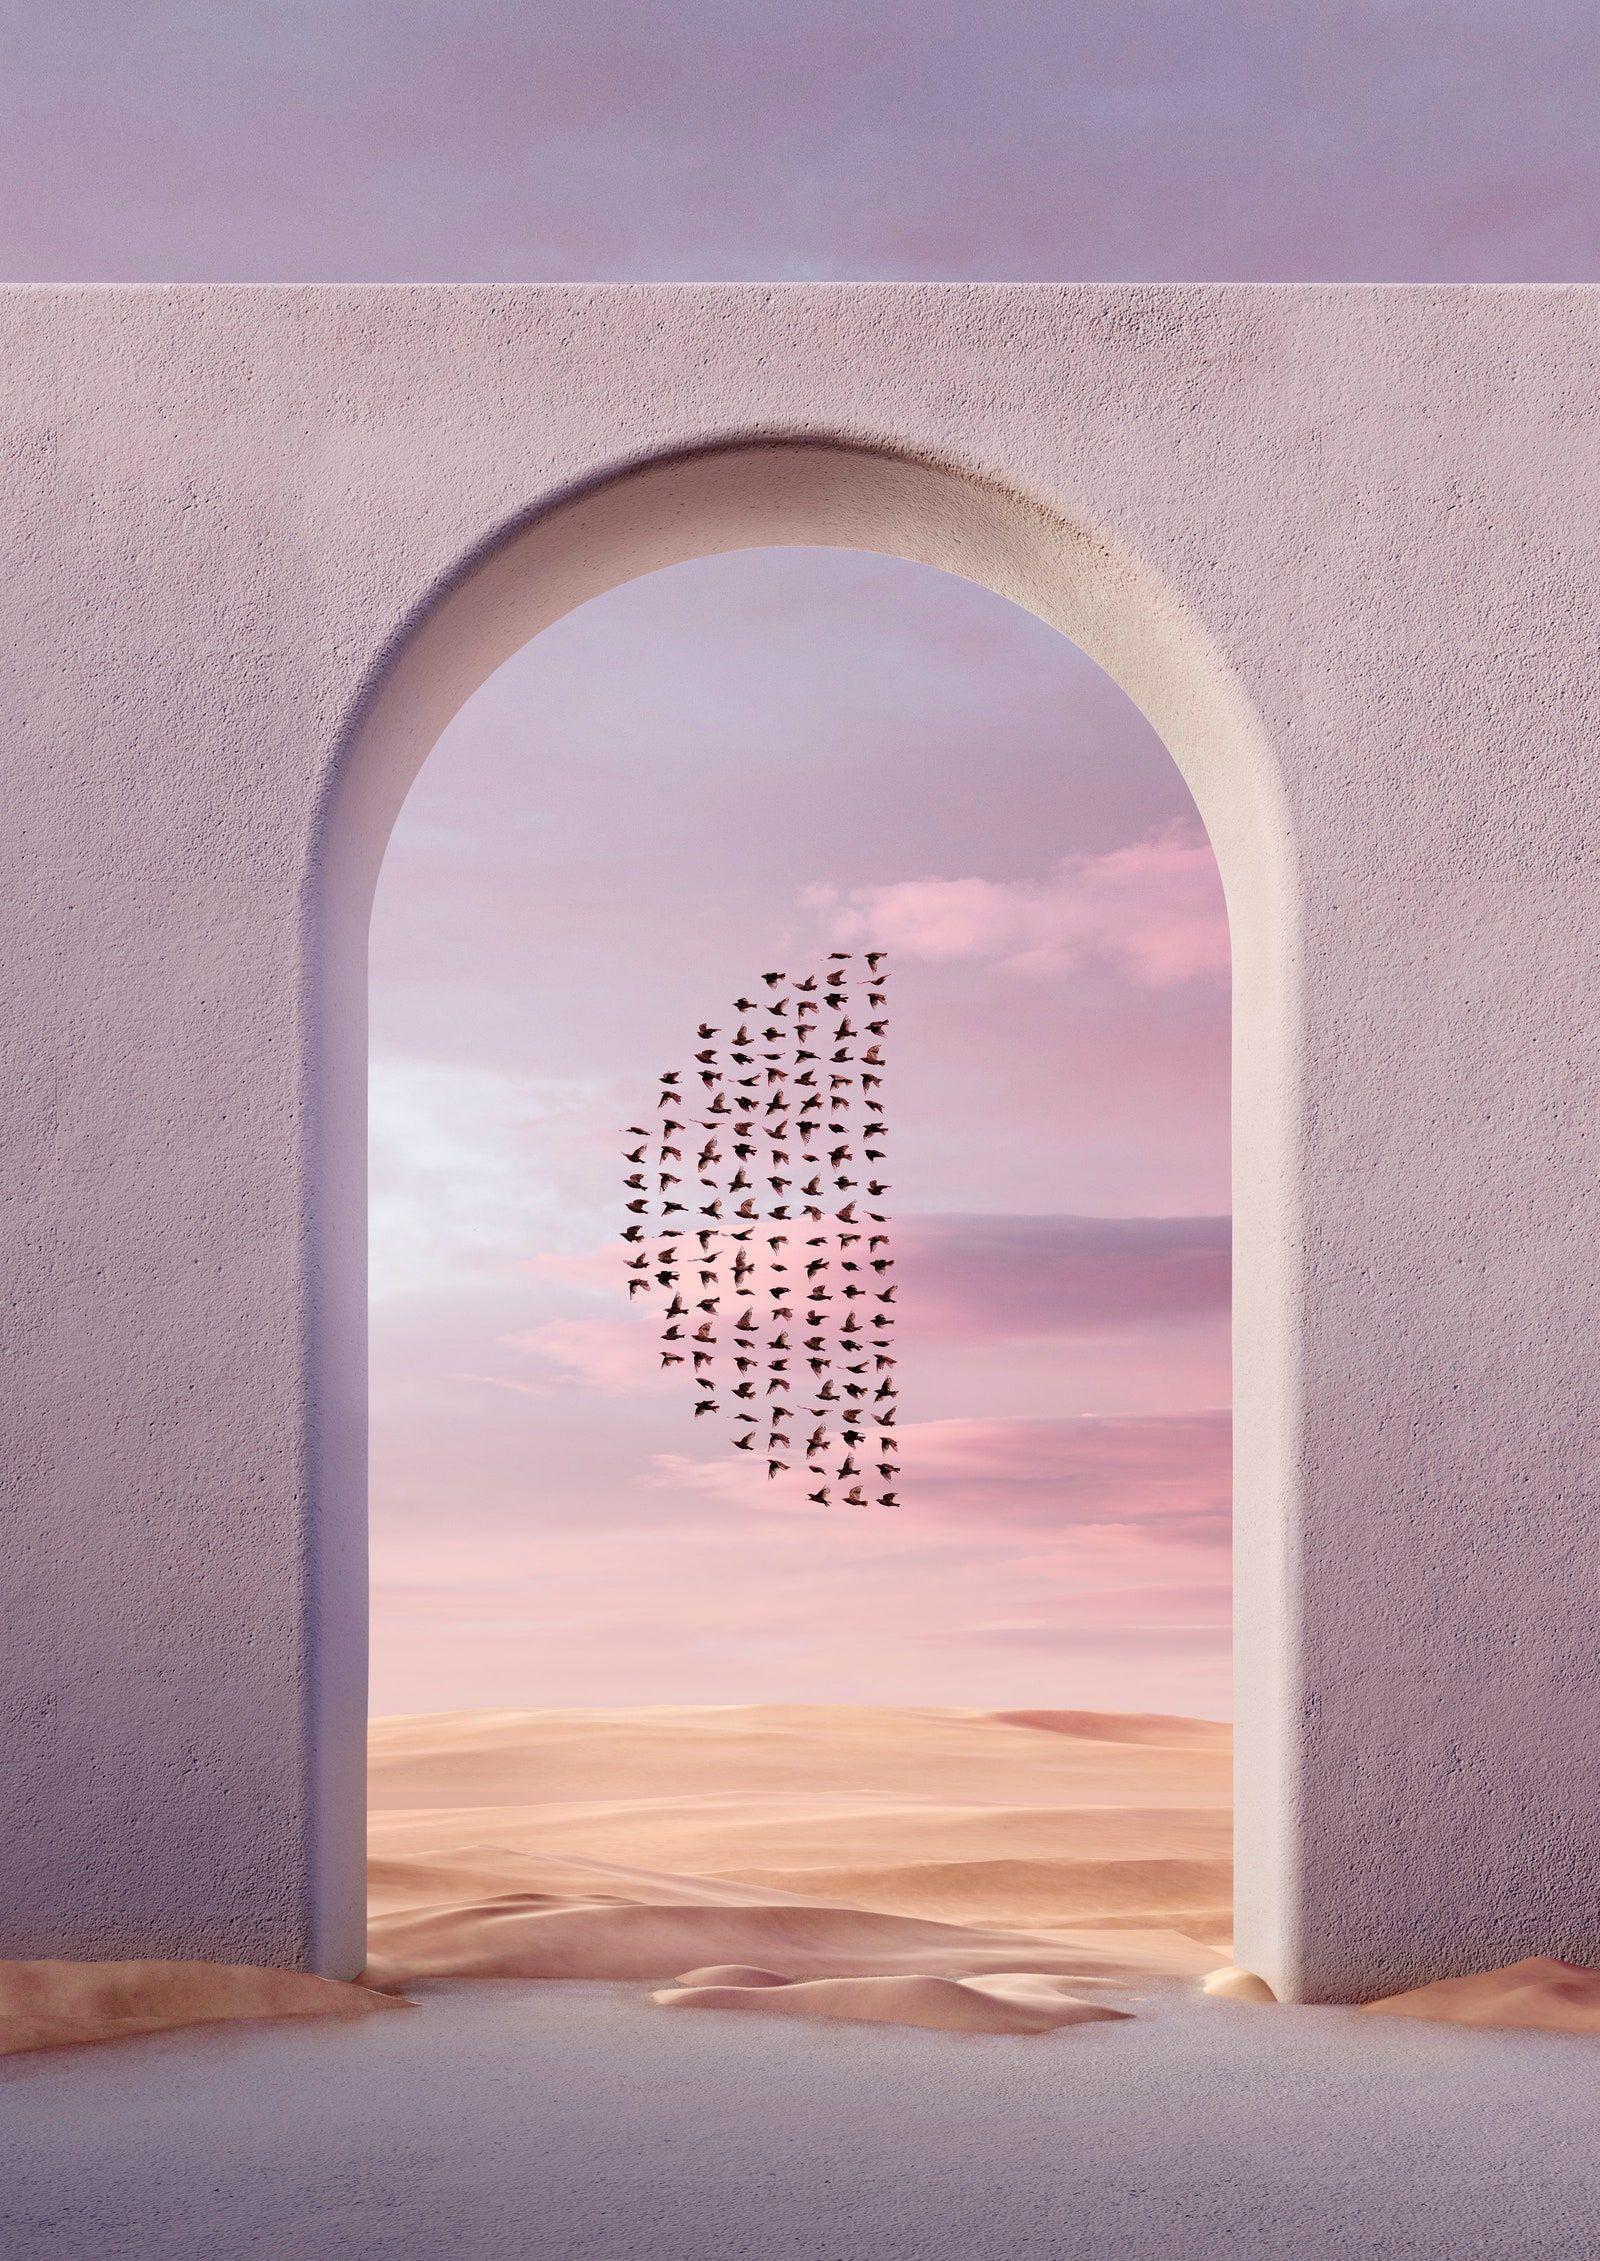 Explore Stunning Dreamscapes Through Artificial